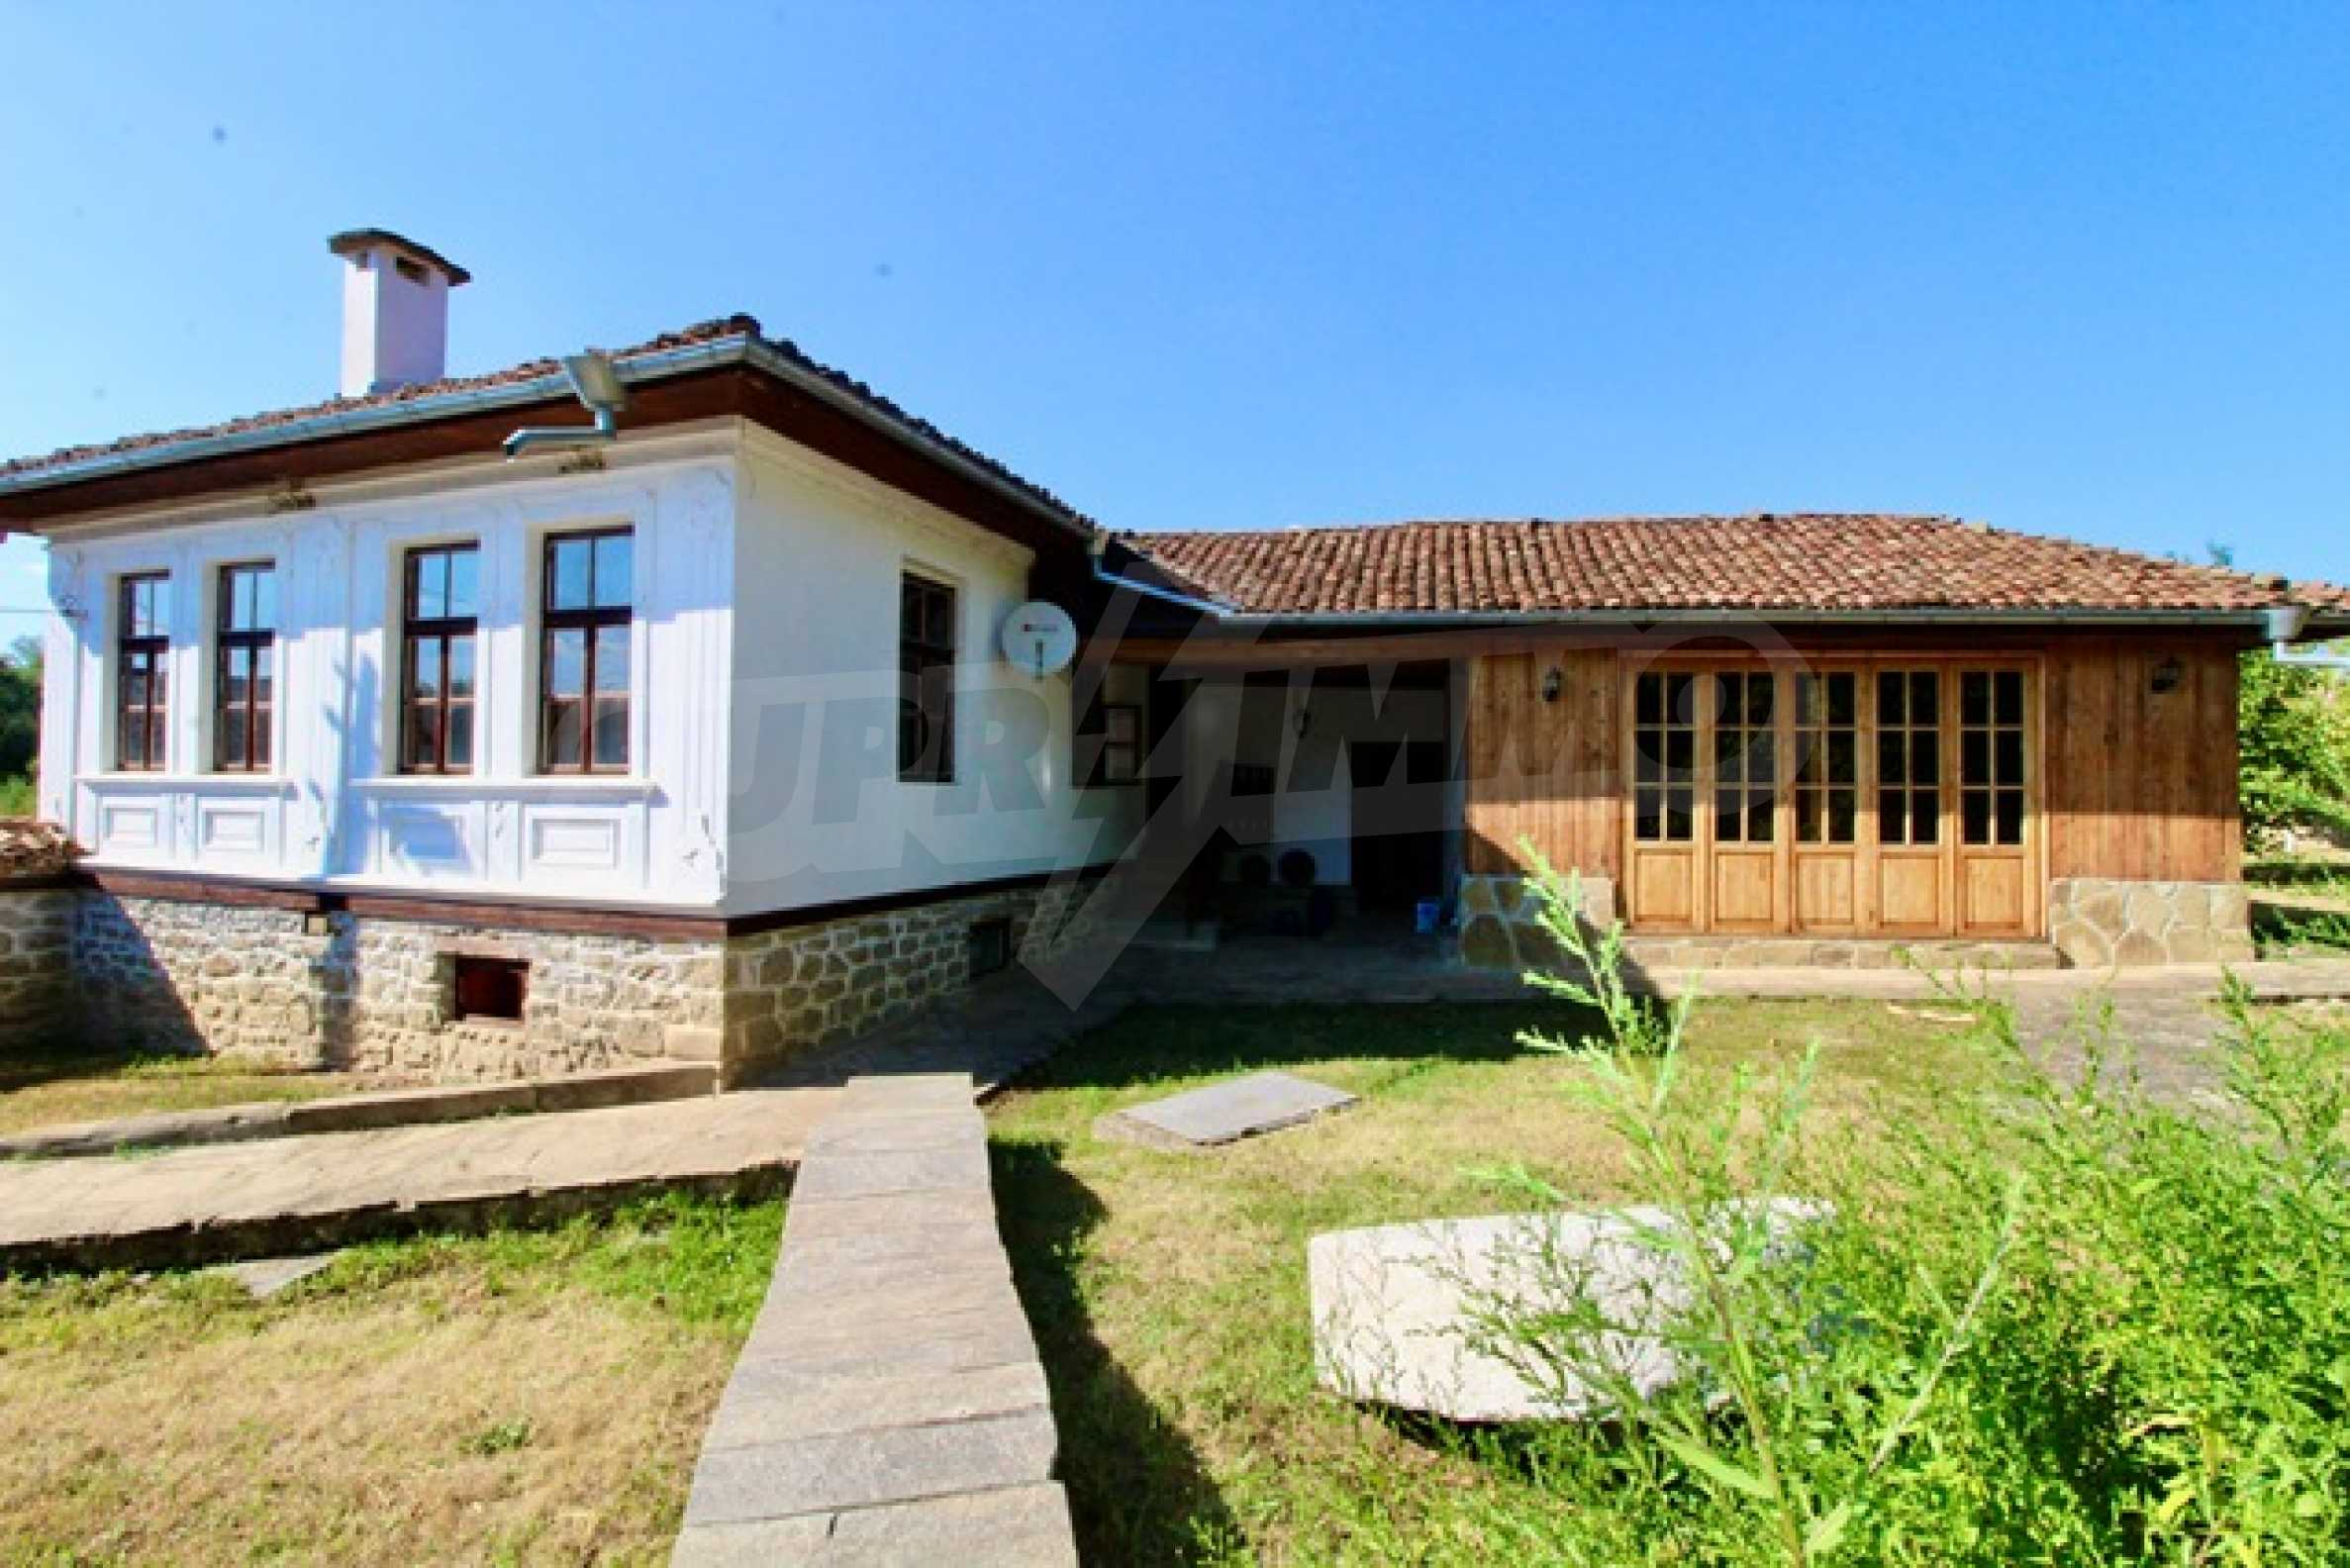 Lovely old house just 17 km away from Veliko Tarnovo